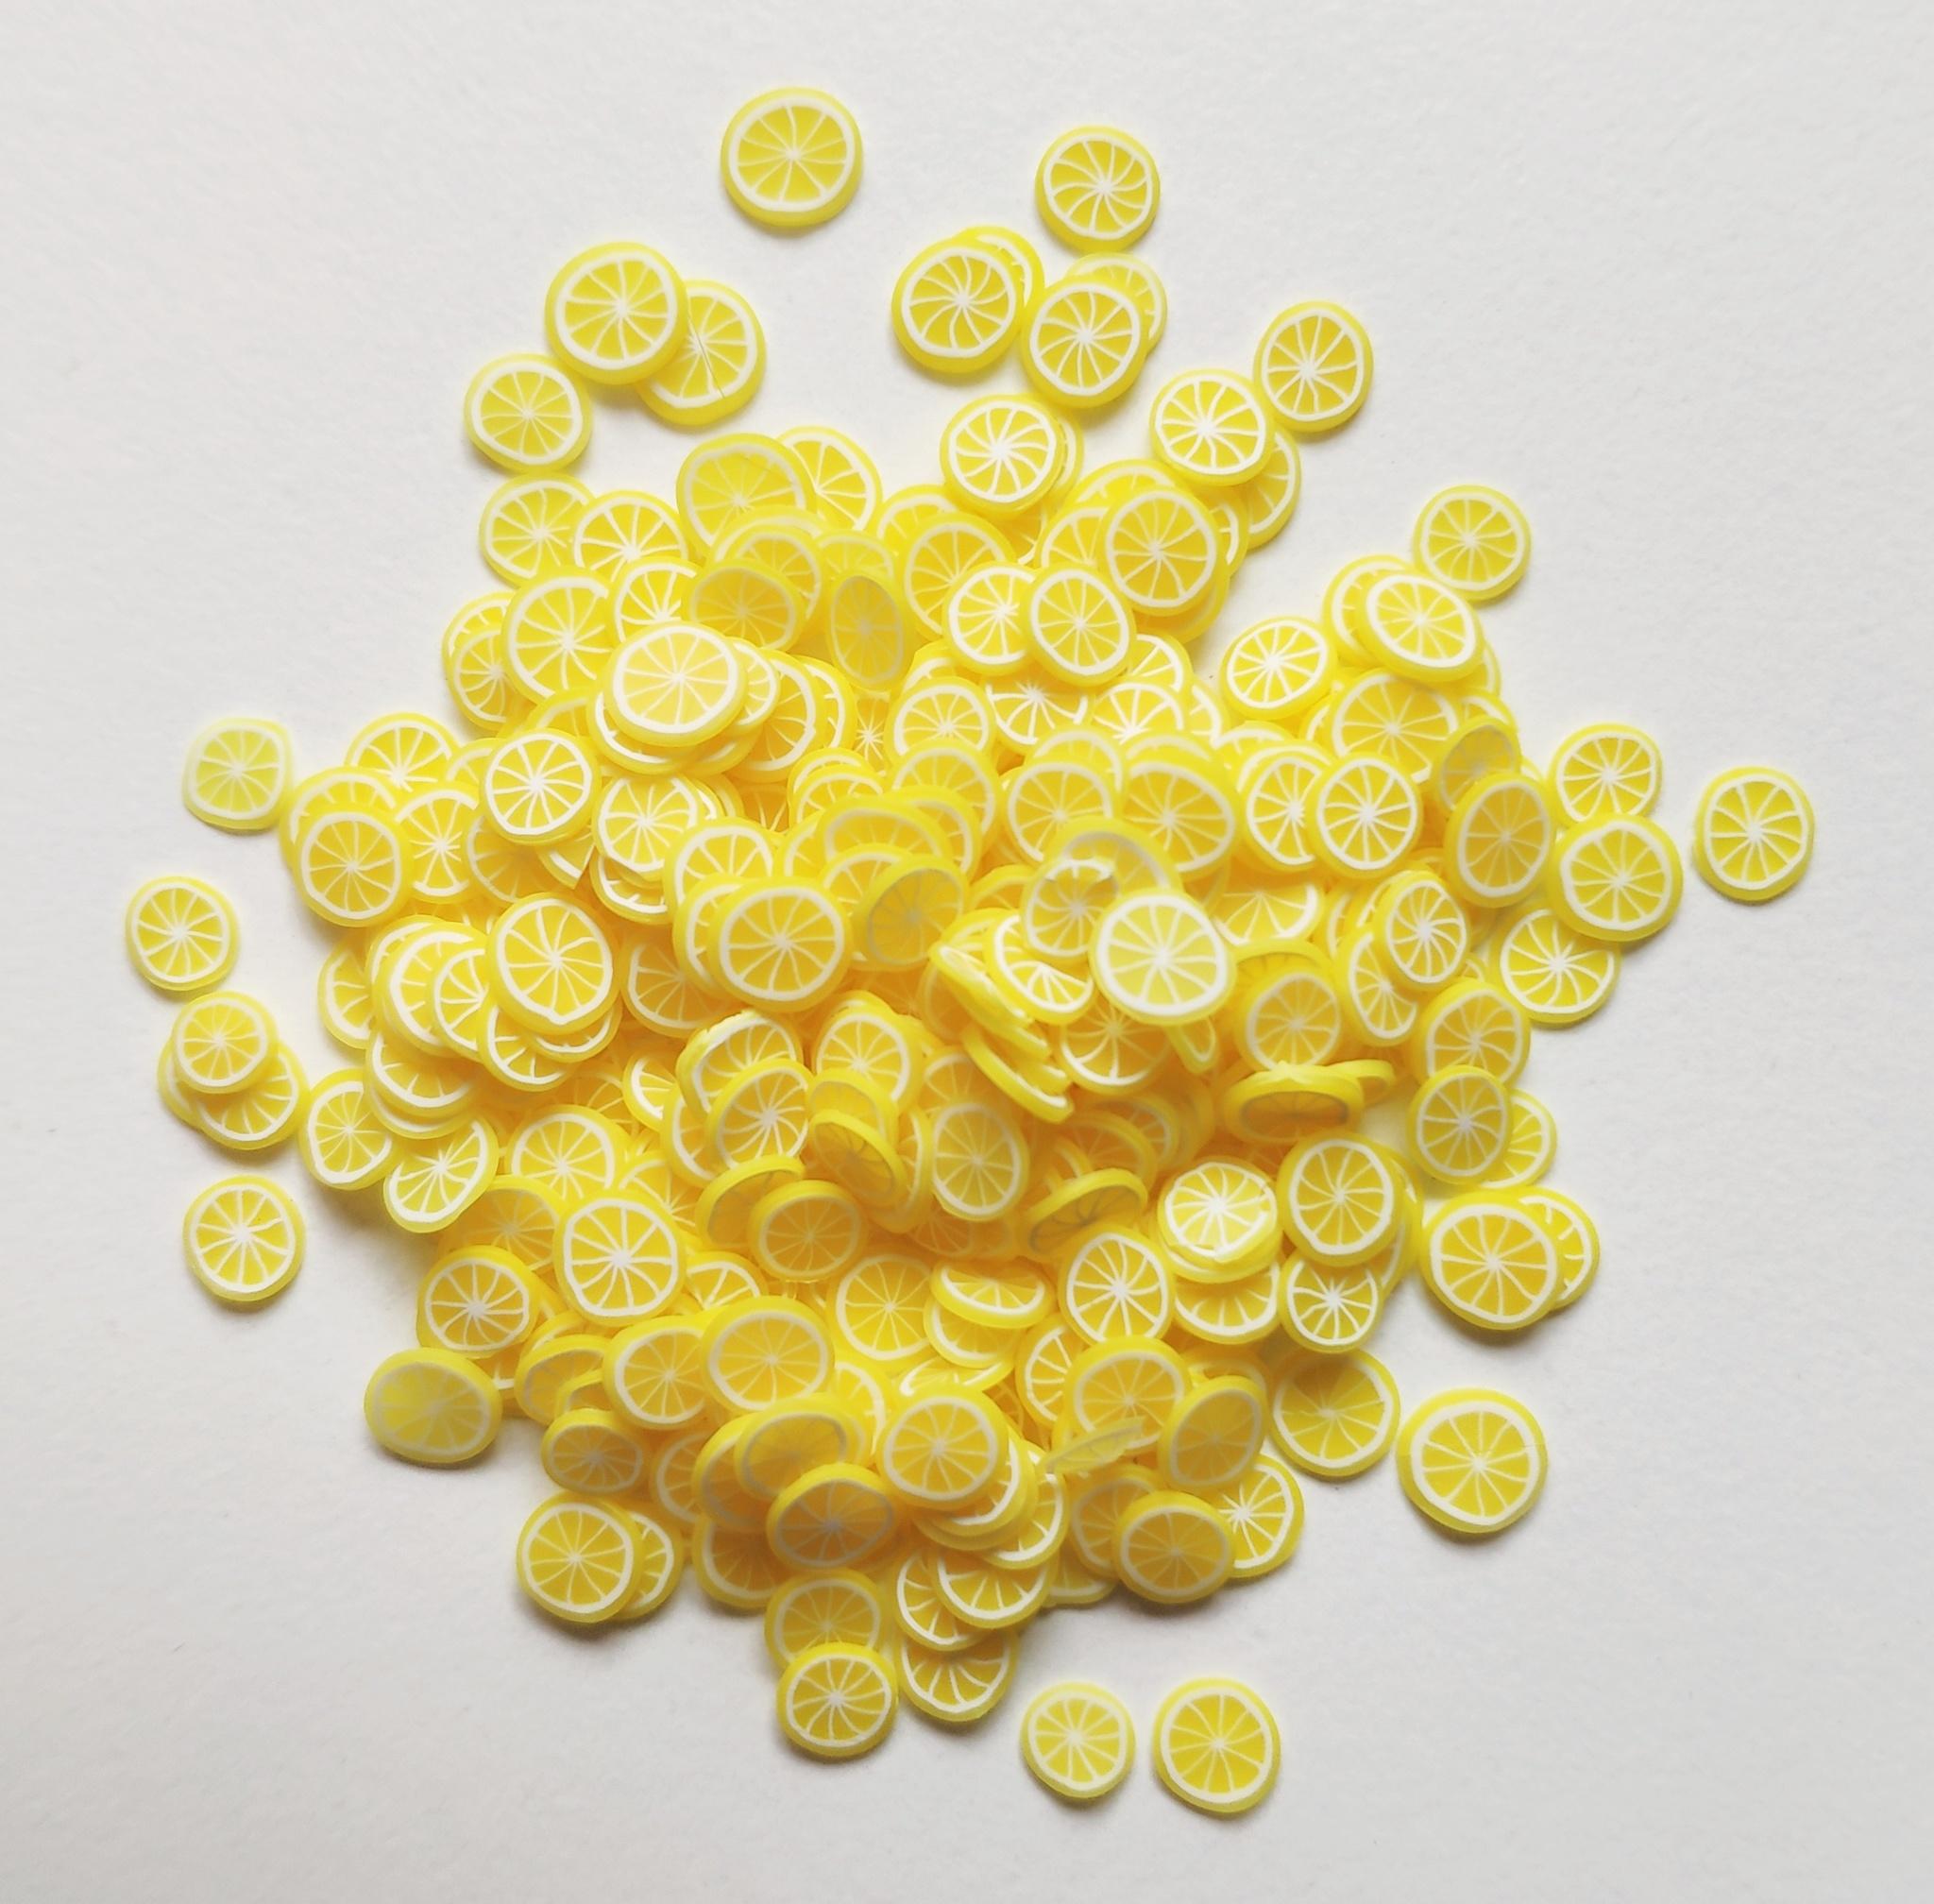 Фимо фрукты для слайма лимон 1 кг